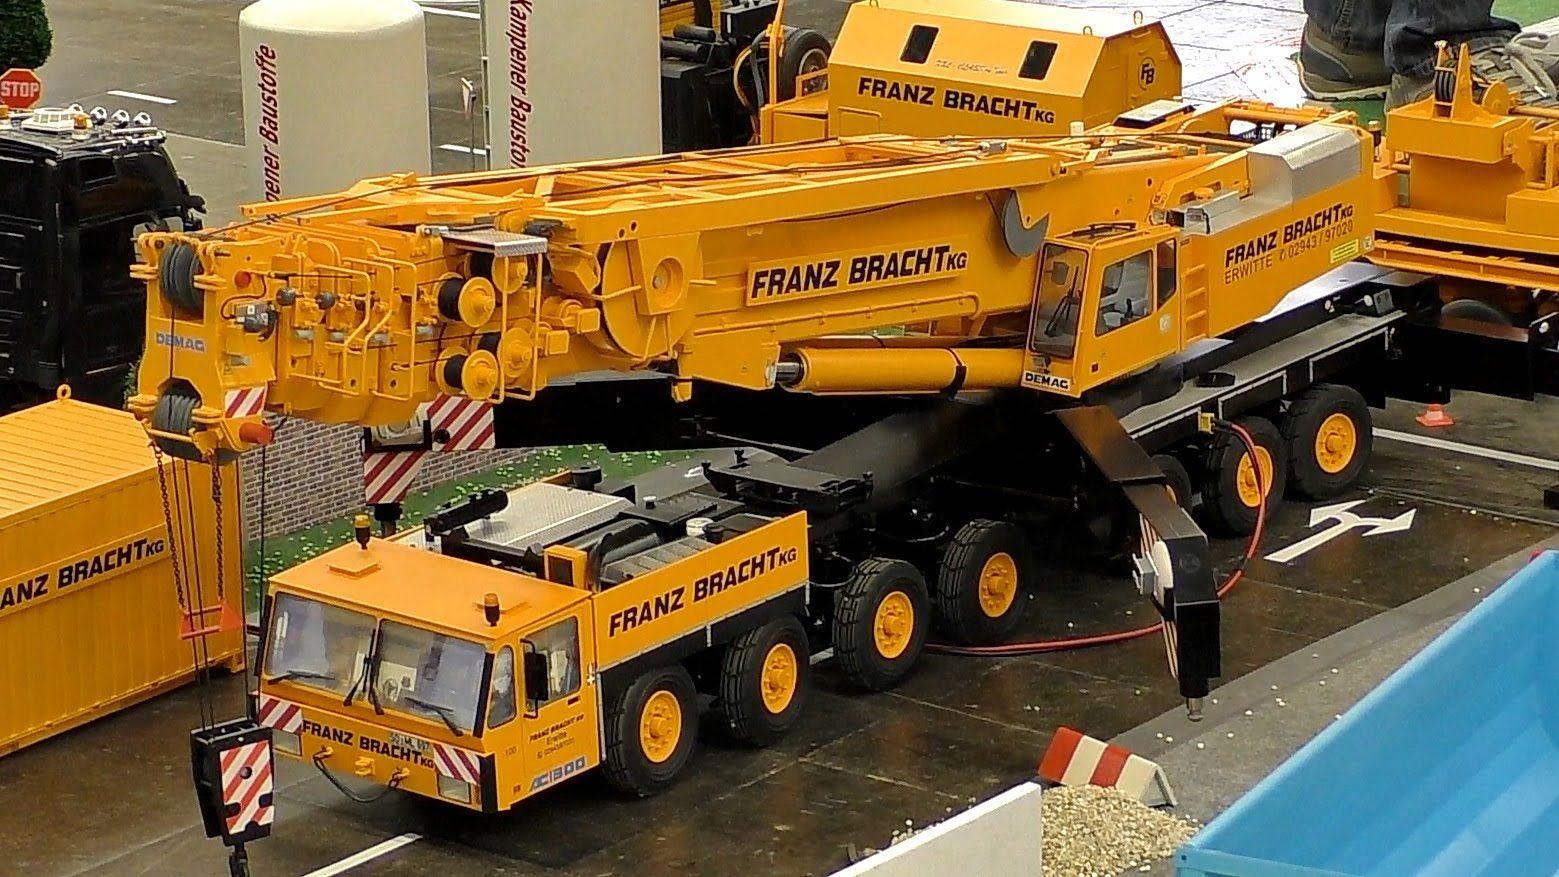 Incredible Remote Controlled LEGO Model Liebherr LTM 1750 ... |Radio Controlled Cranes